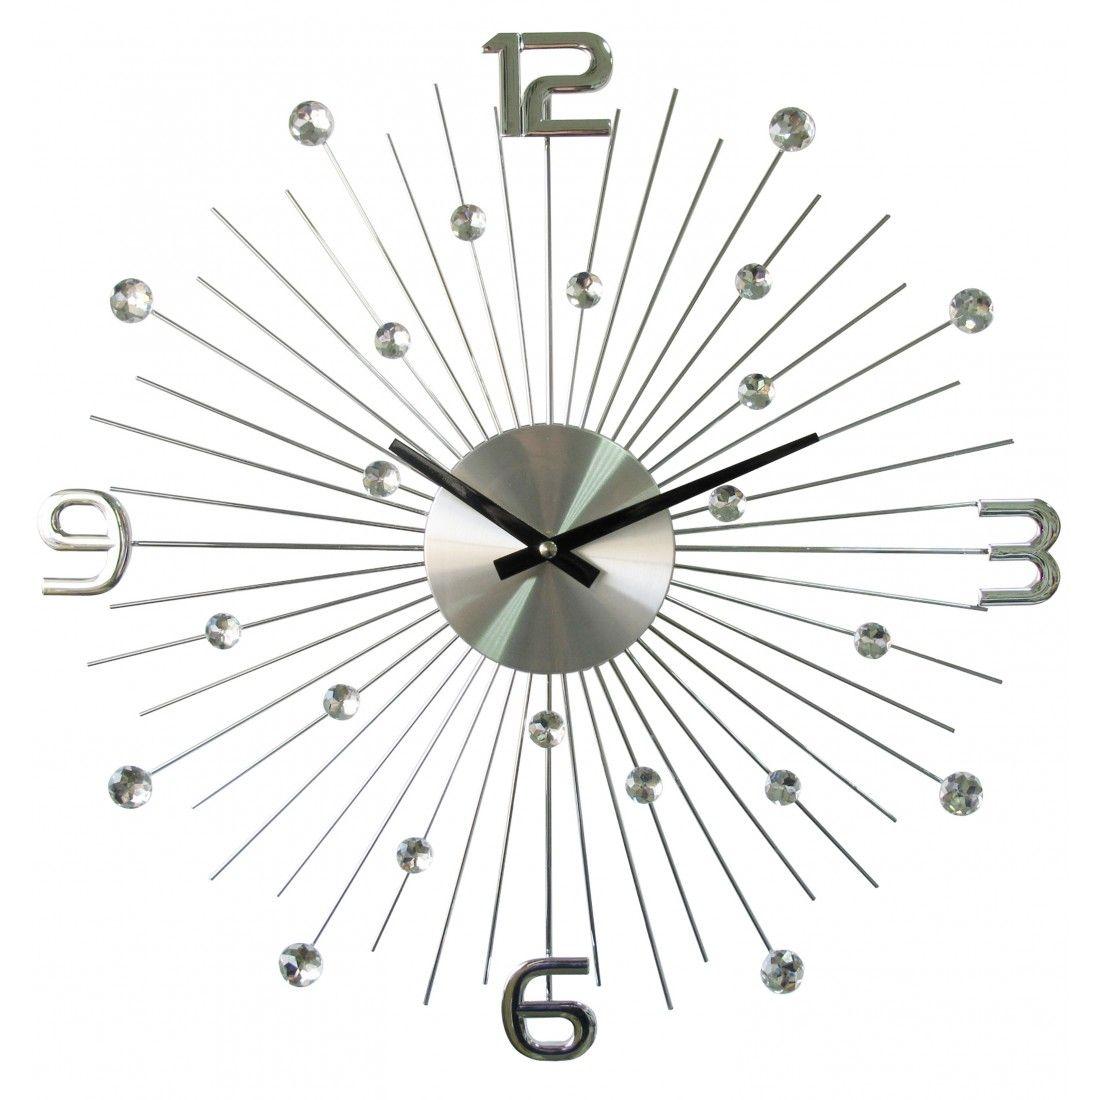 Piccolo Million Dollar Wall Clock http://www.franceandson.com/piccolo-million-dollar-wall-clock.html